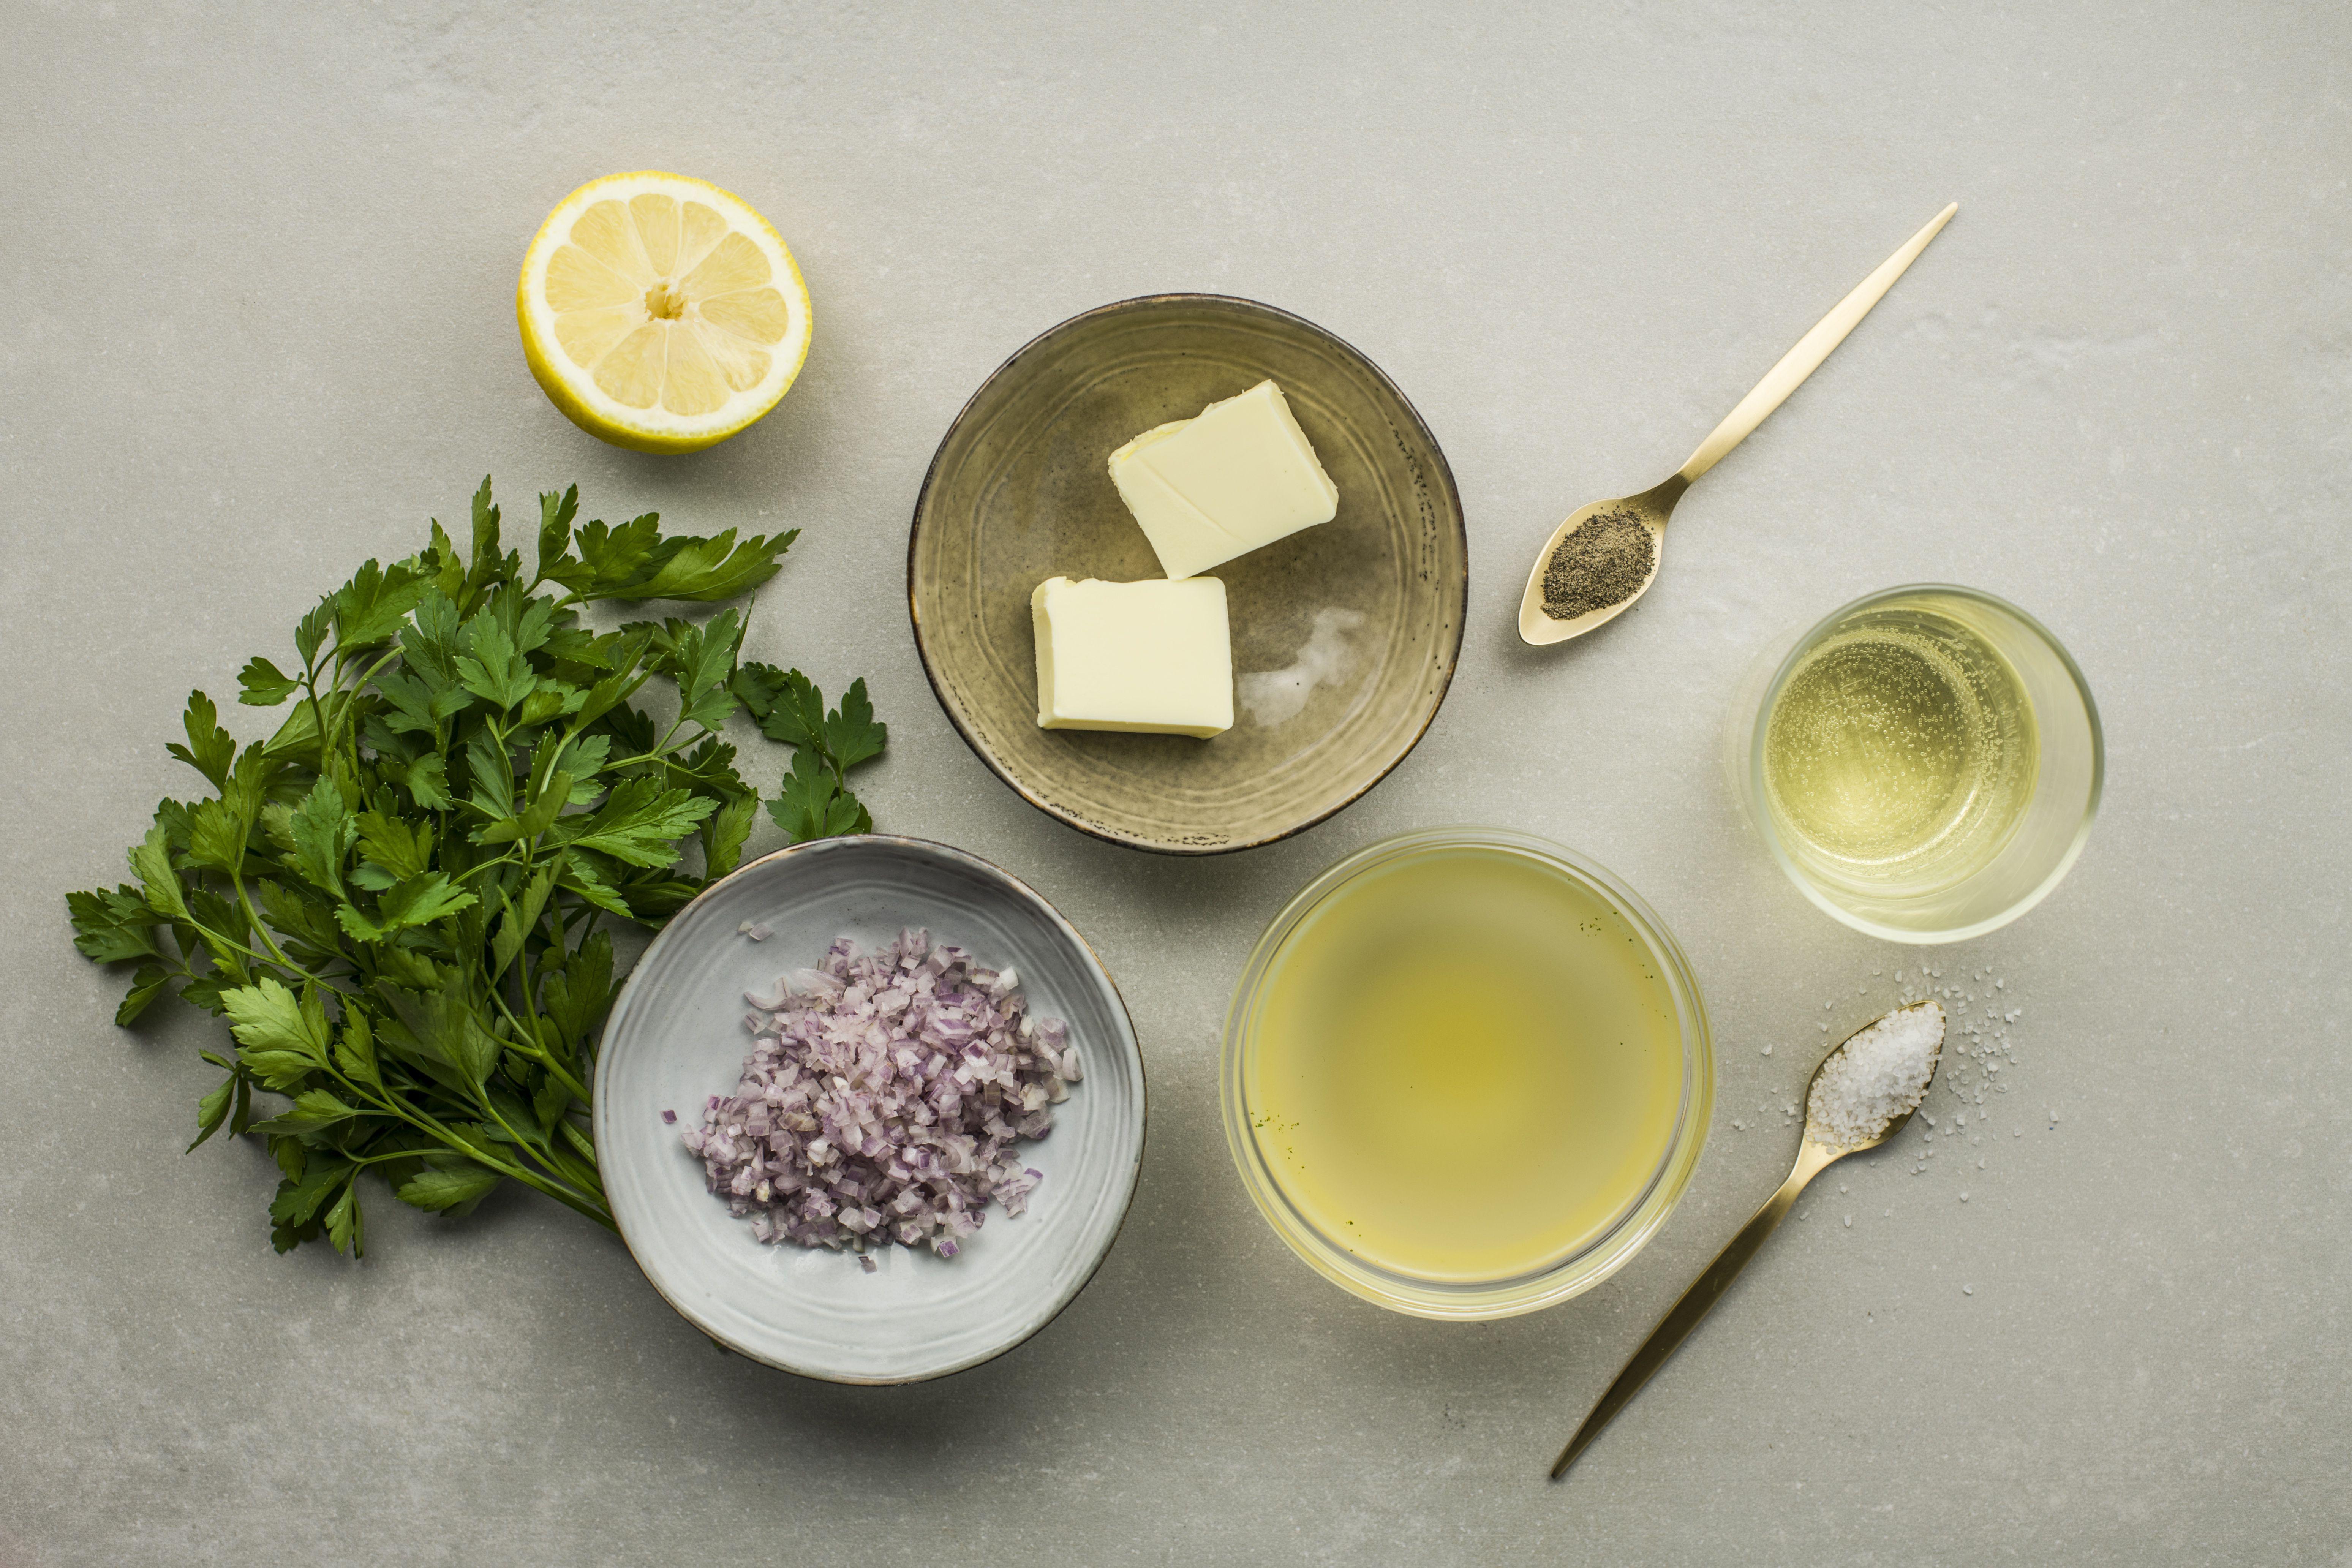 Basic reduction sauce gravy ingredients